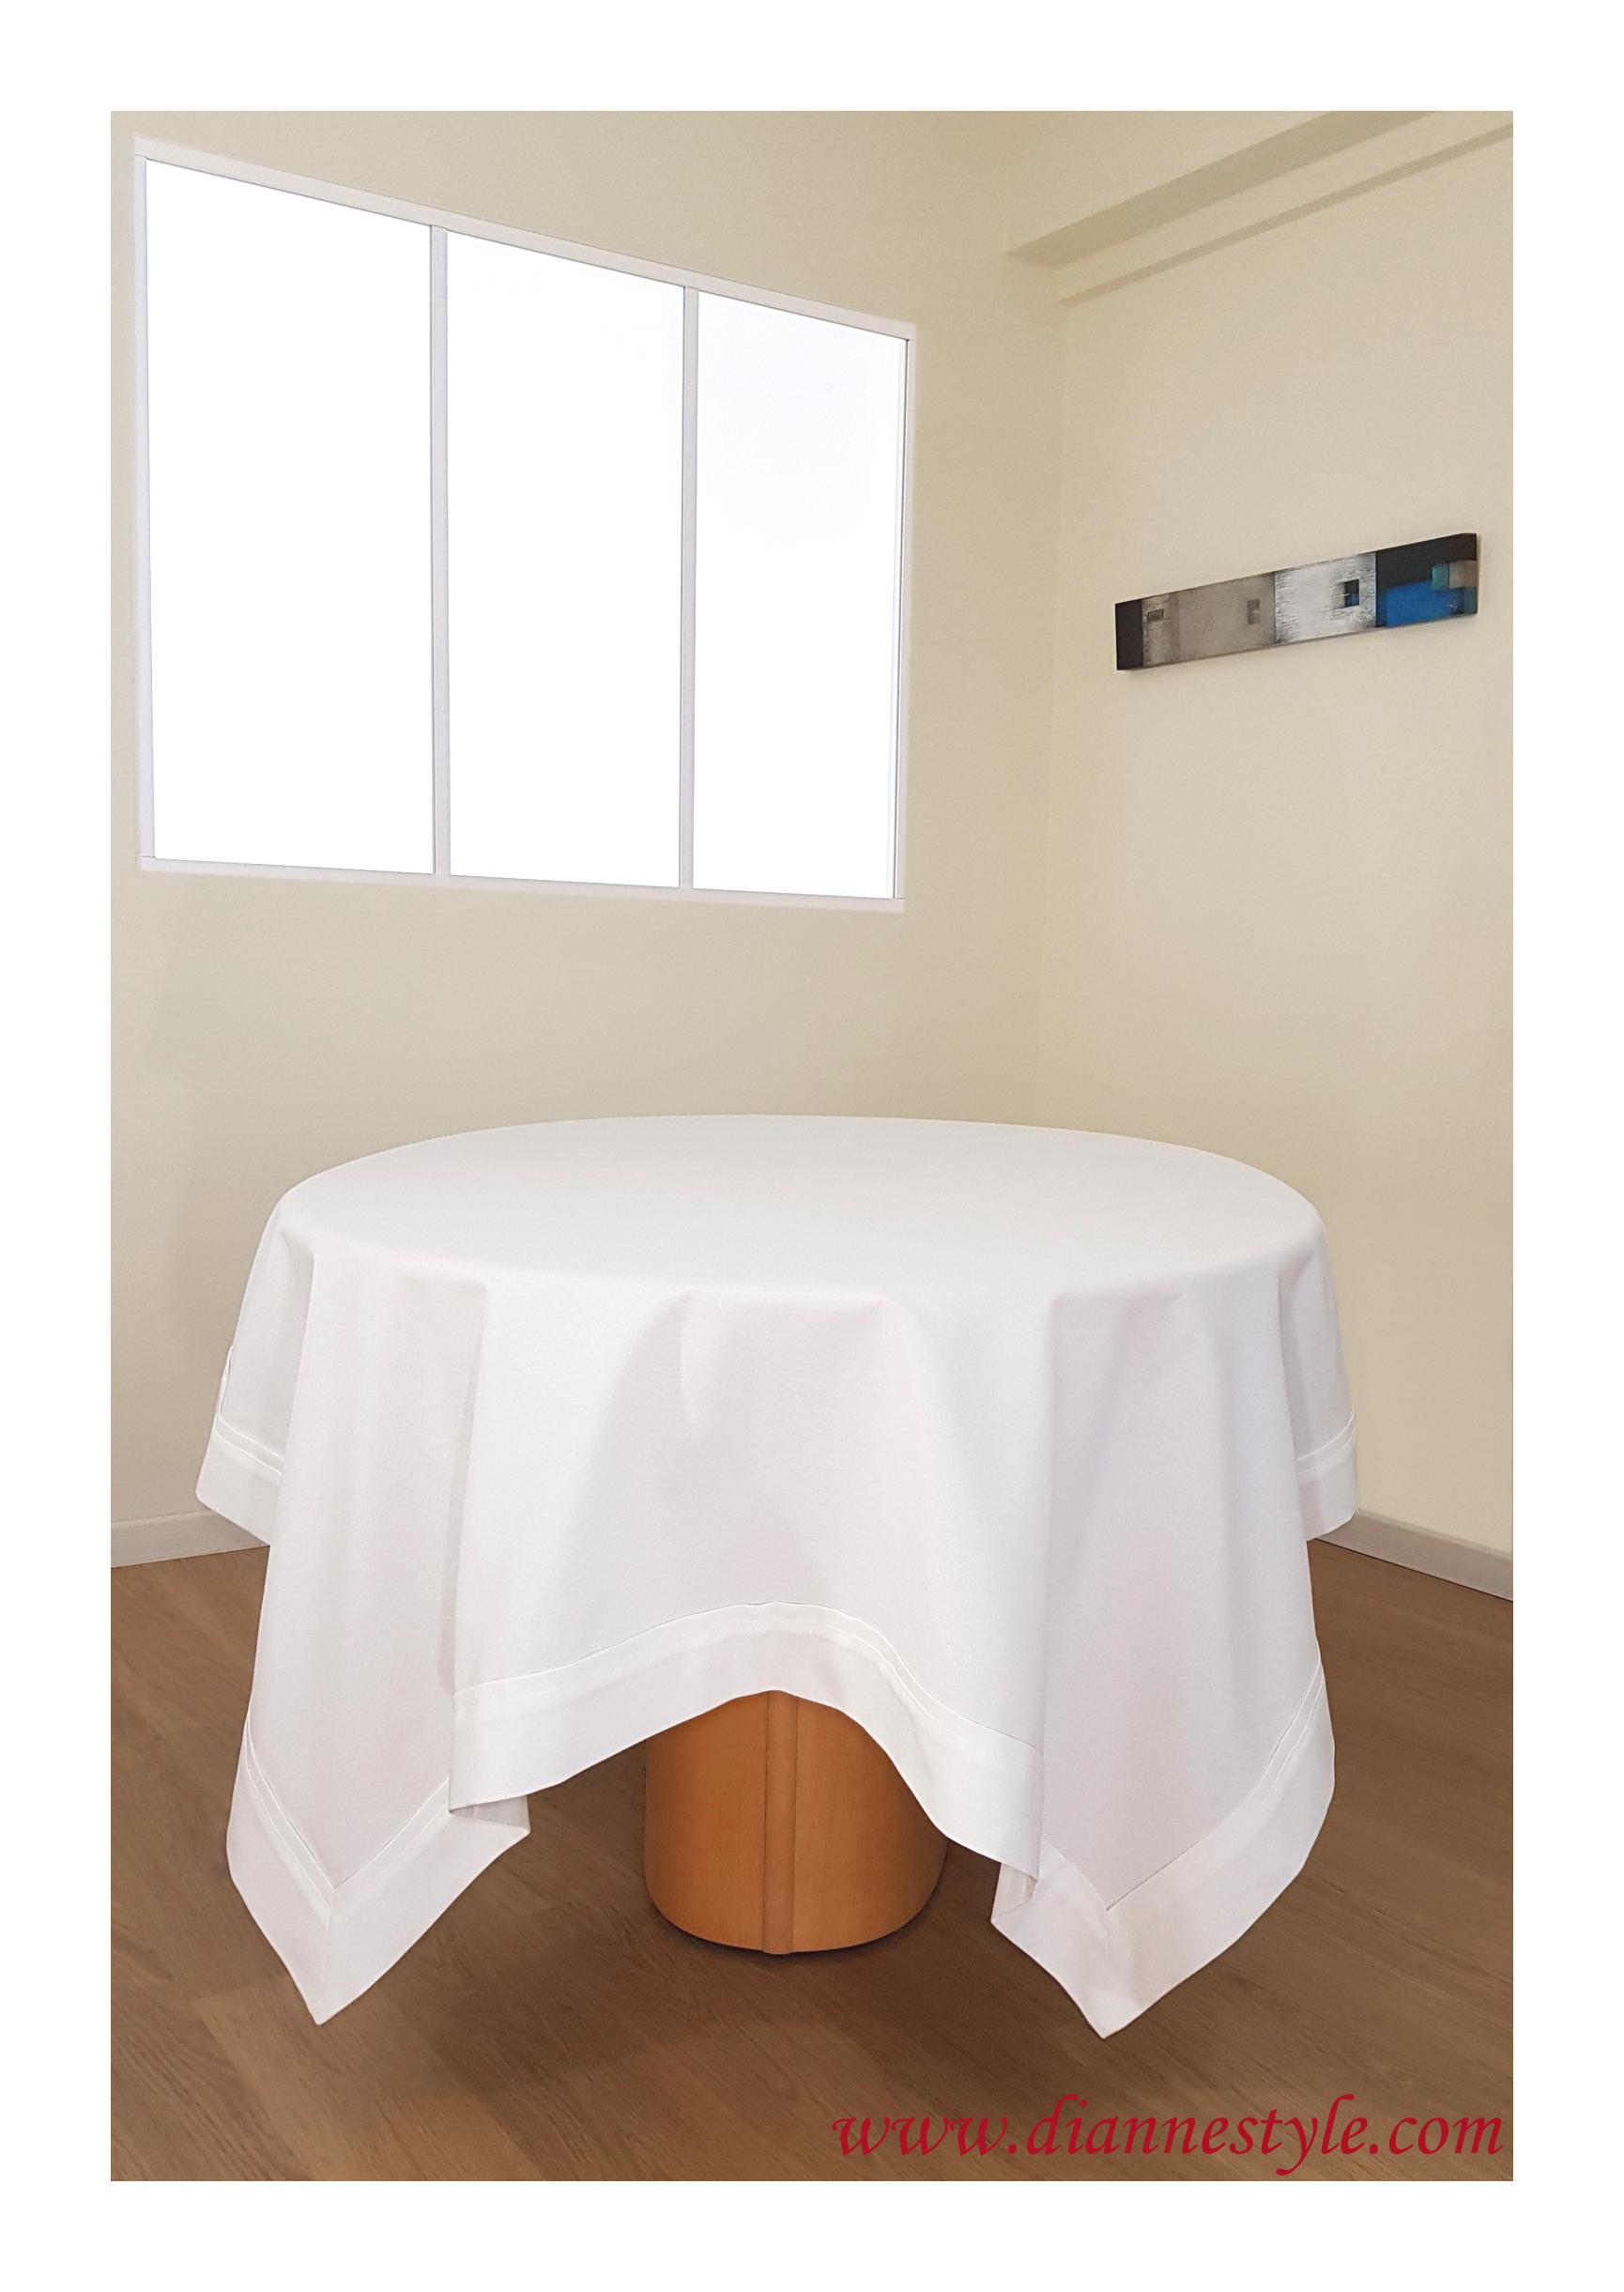 Nappe rectangulaire blanche Gardénia 150x250 cm. Réf. 348